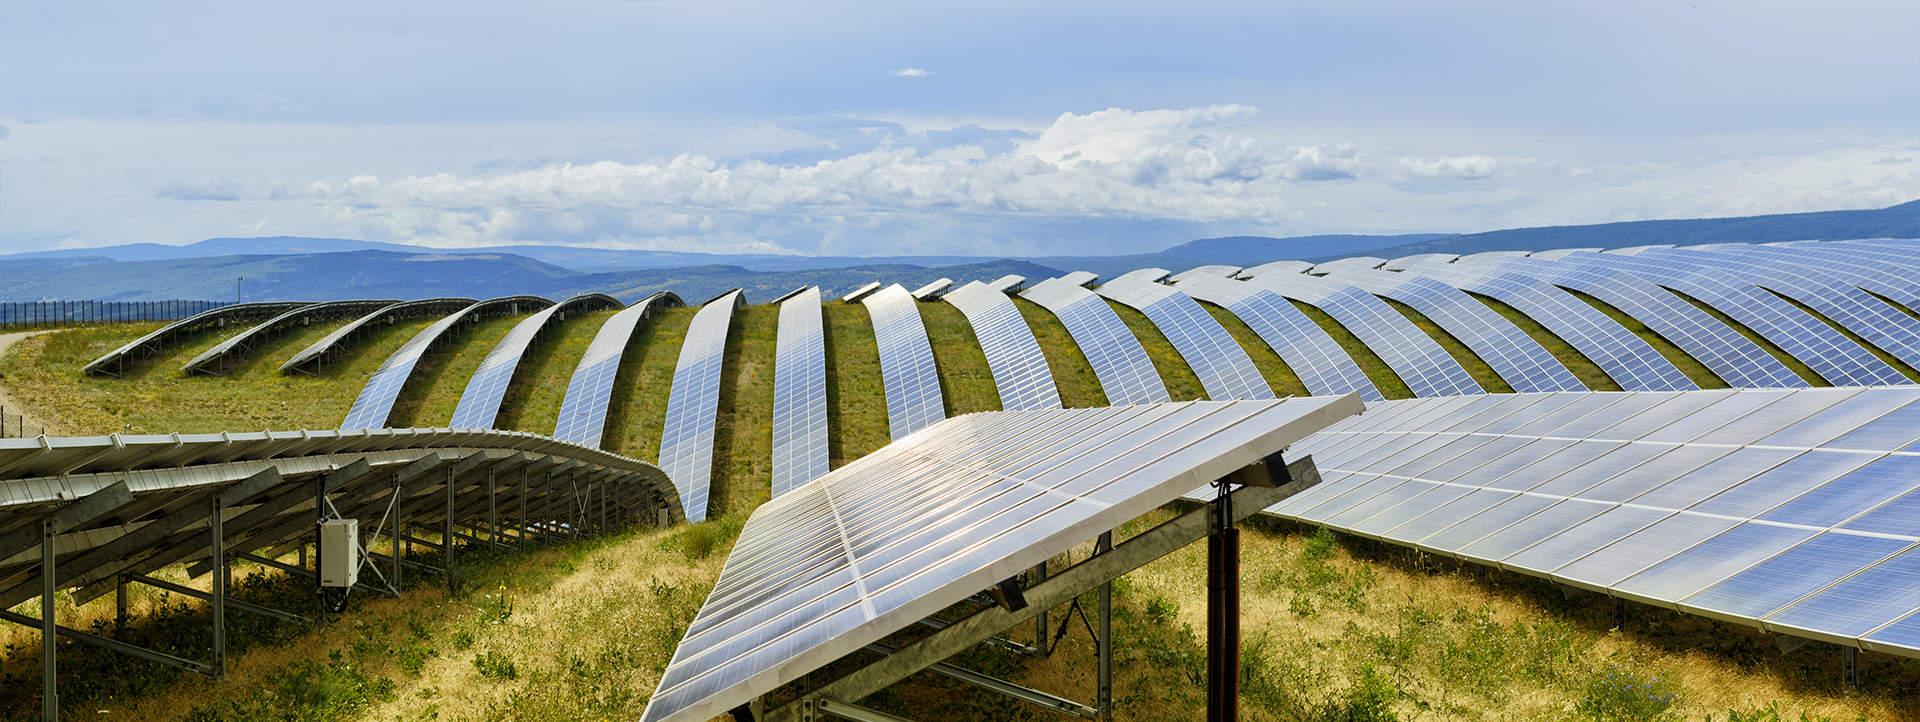 Solar landbouwsector